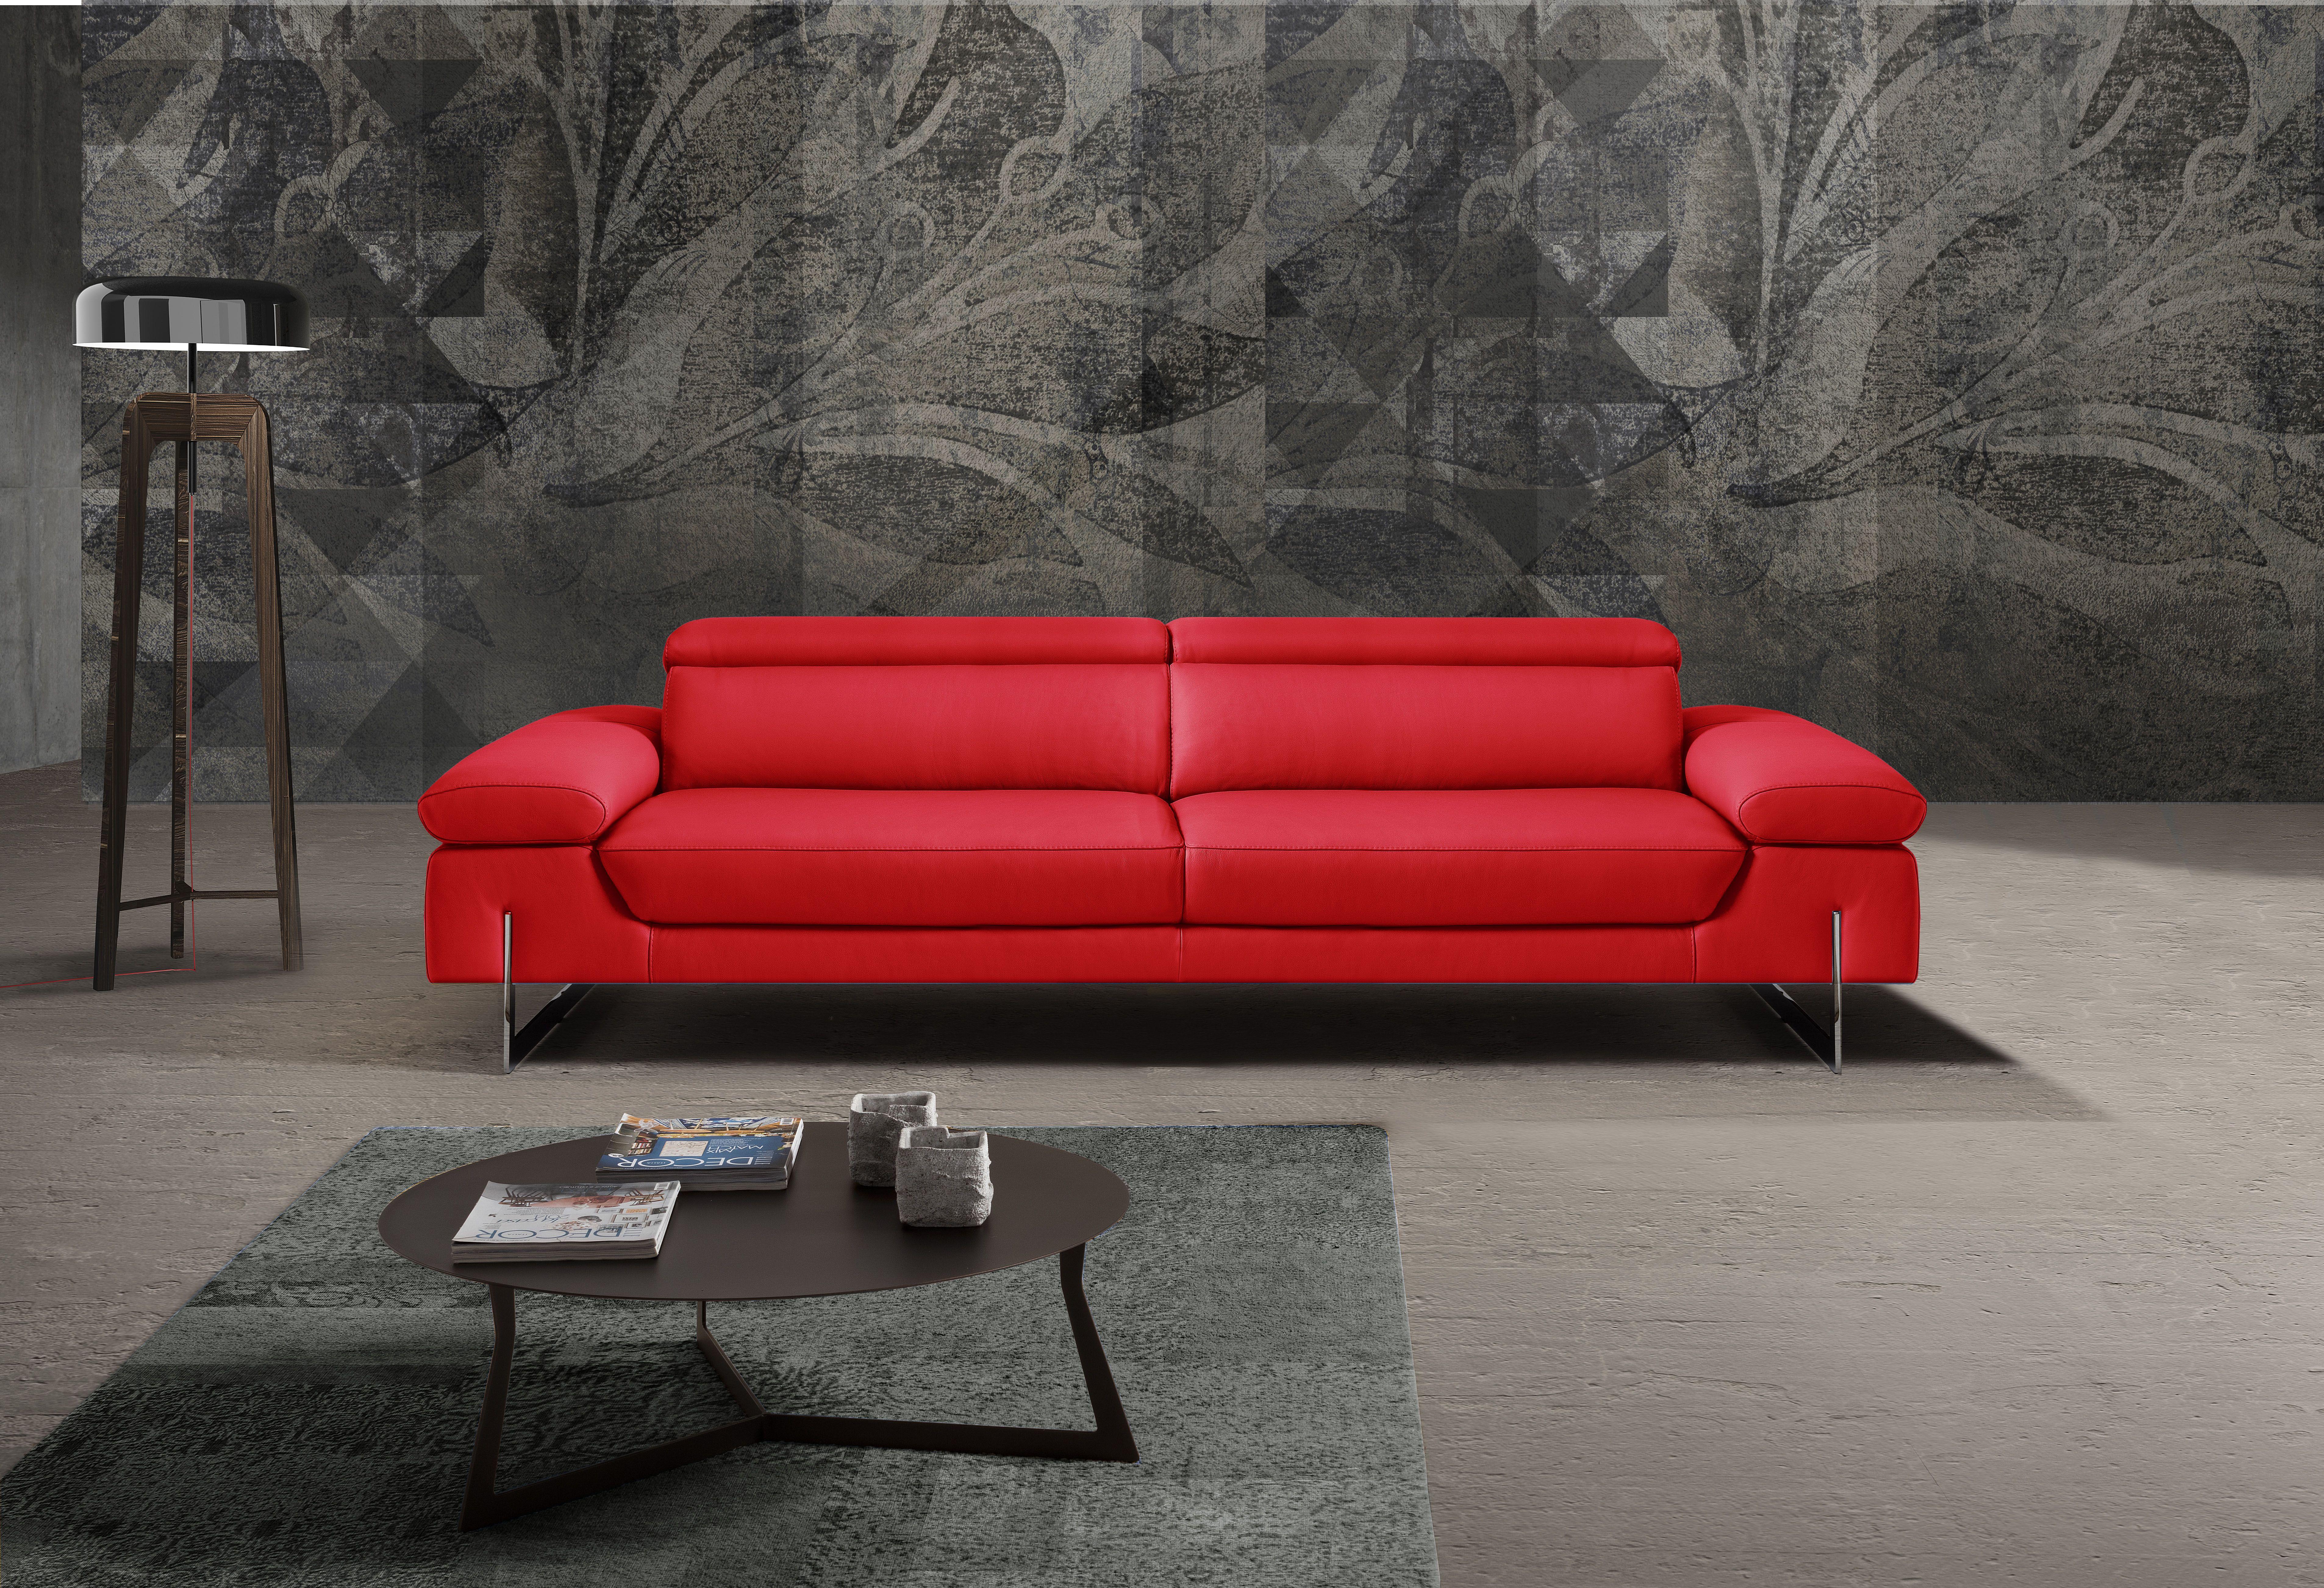 Ecointeriors Ecoexclusive Egoitaliano Couch Italian Design Dublin Santry Dunlaoghaire Koltuklar Kanepeler Konsol